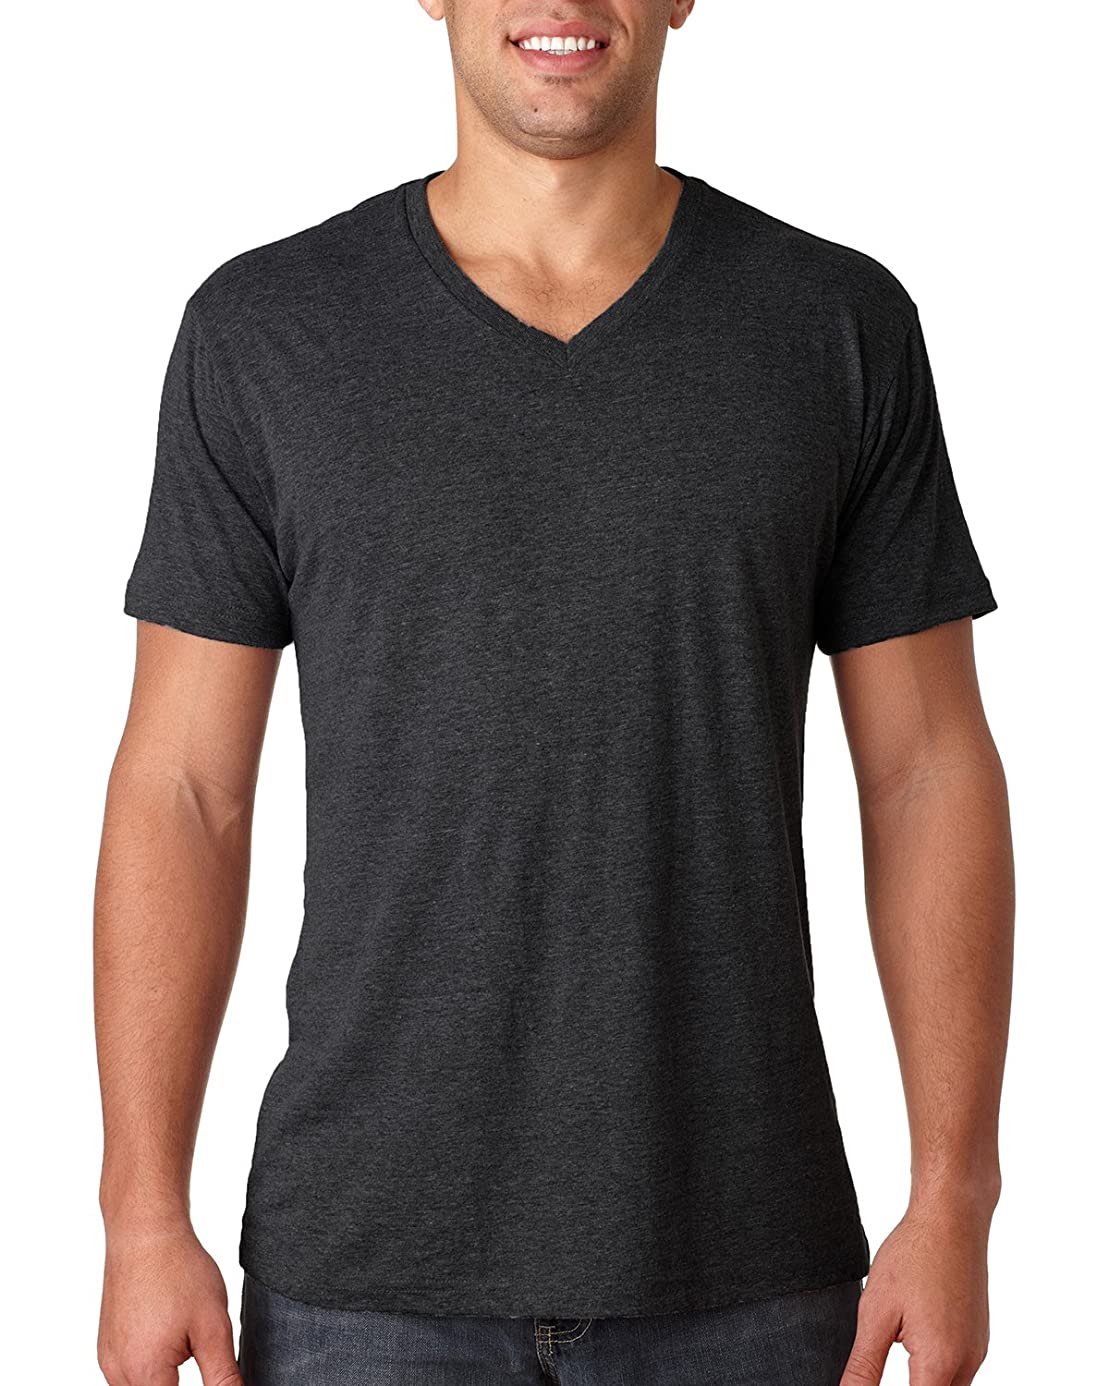 Next Level Men's Tri-Blend V (Vintage Black) (Small) gba9215179